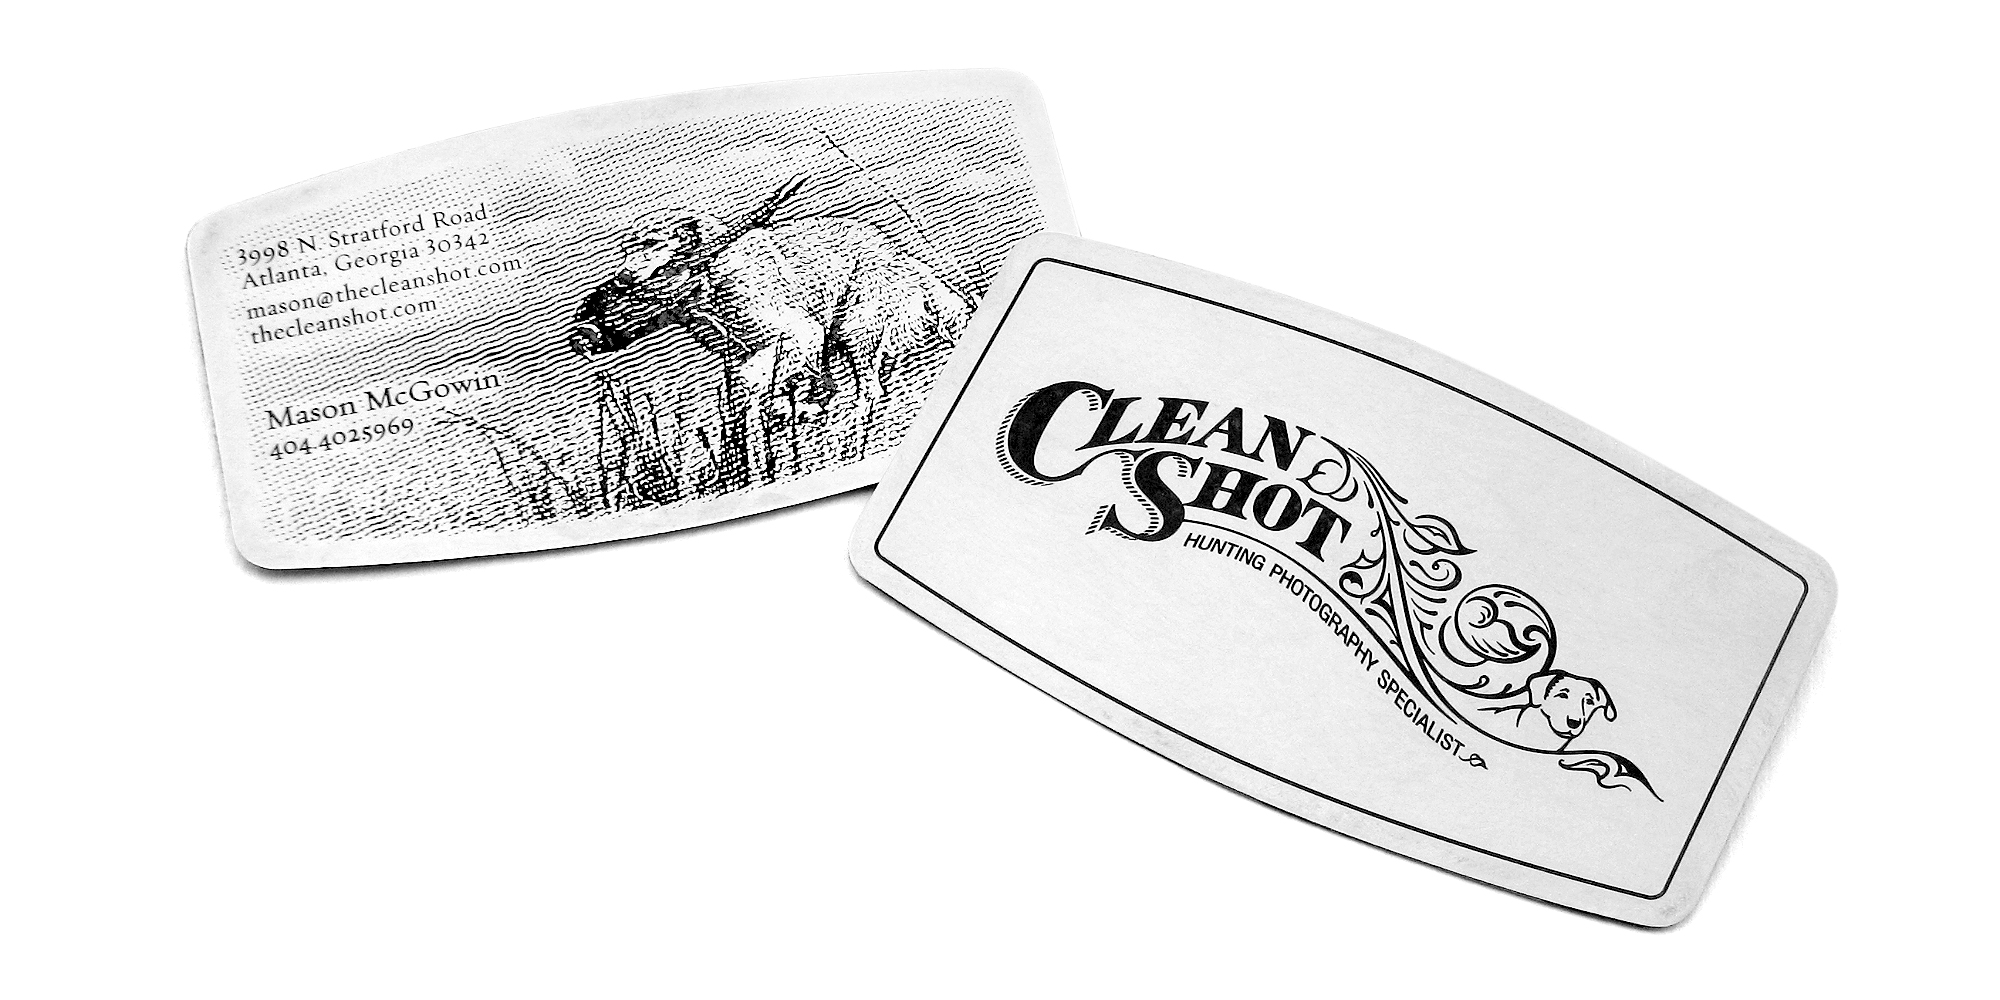 PRINT DESIGN - Clean Shot | business cards - ©UnParalleled, LLC dba UP-Ideas / Roger Sawhill / Mark Braught - Atlanta, Georgia | Lawrenceville, Georgia | Commerce, Georgia